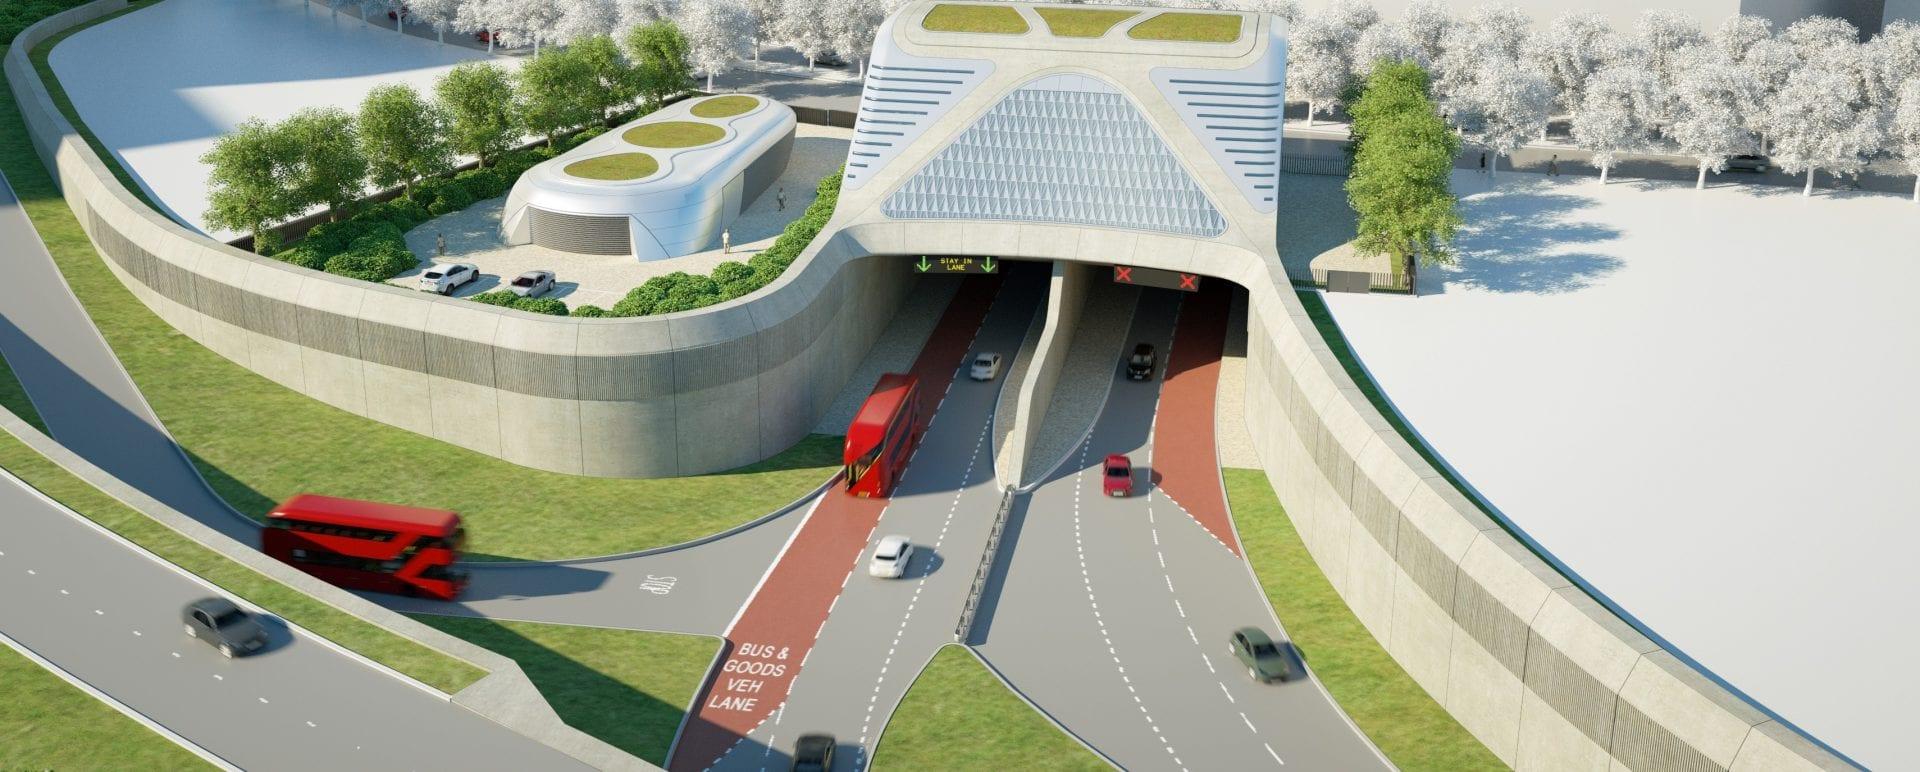 Silvertown tunnel entrance